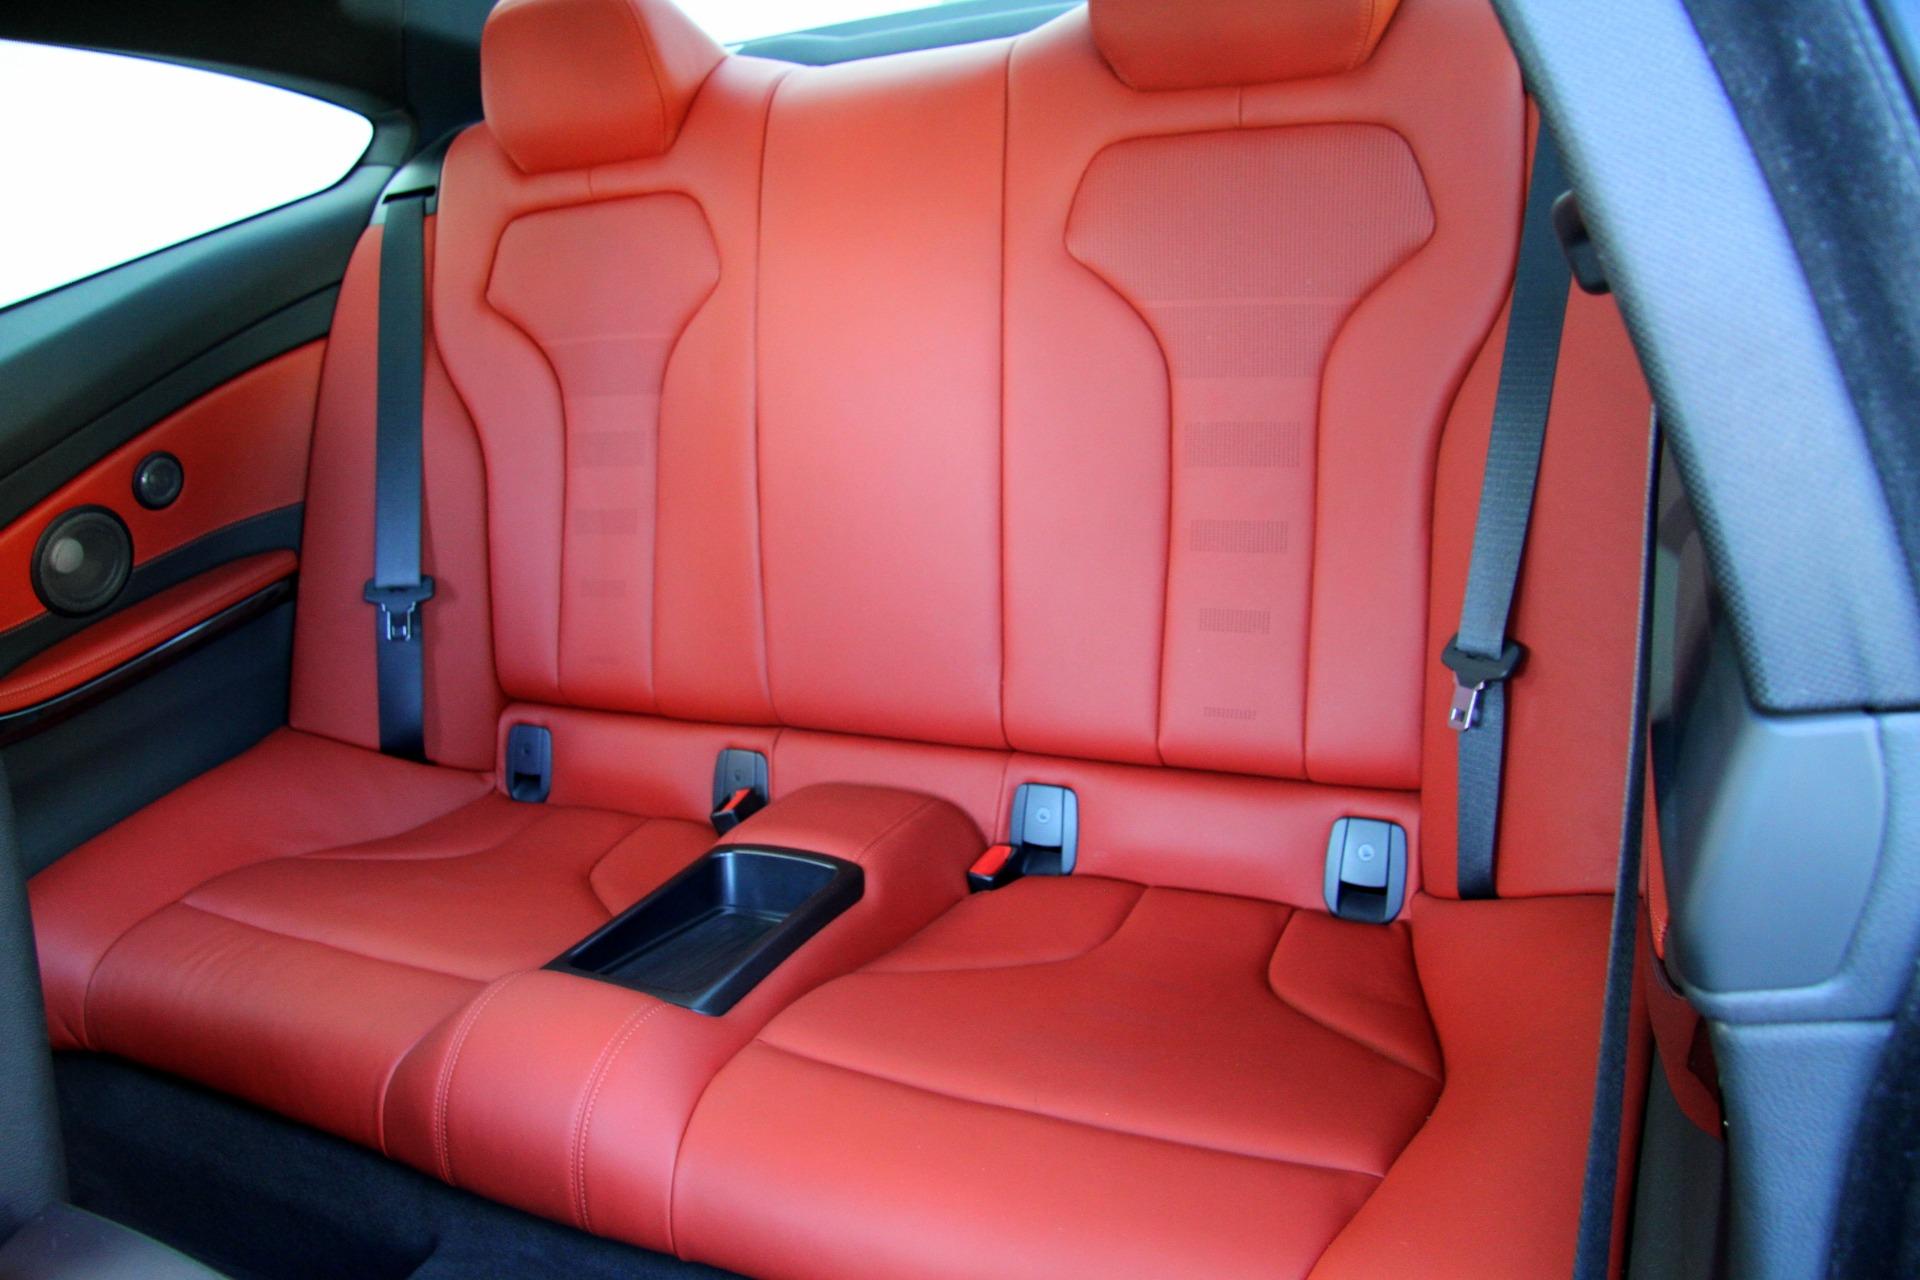 2016 Bmw M4 Executive Pkg Stock 6079 For Sale Near